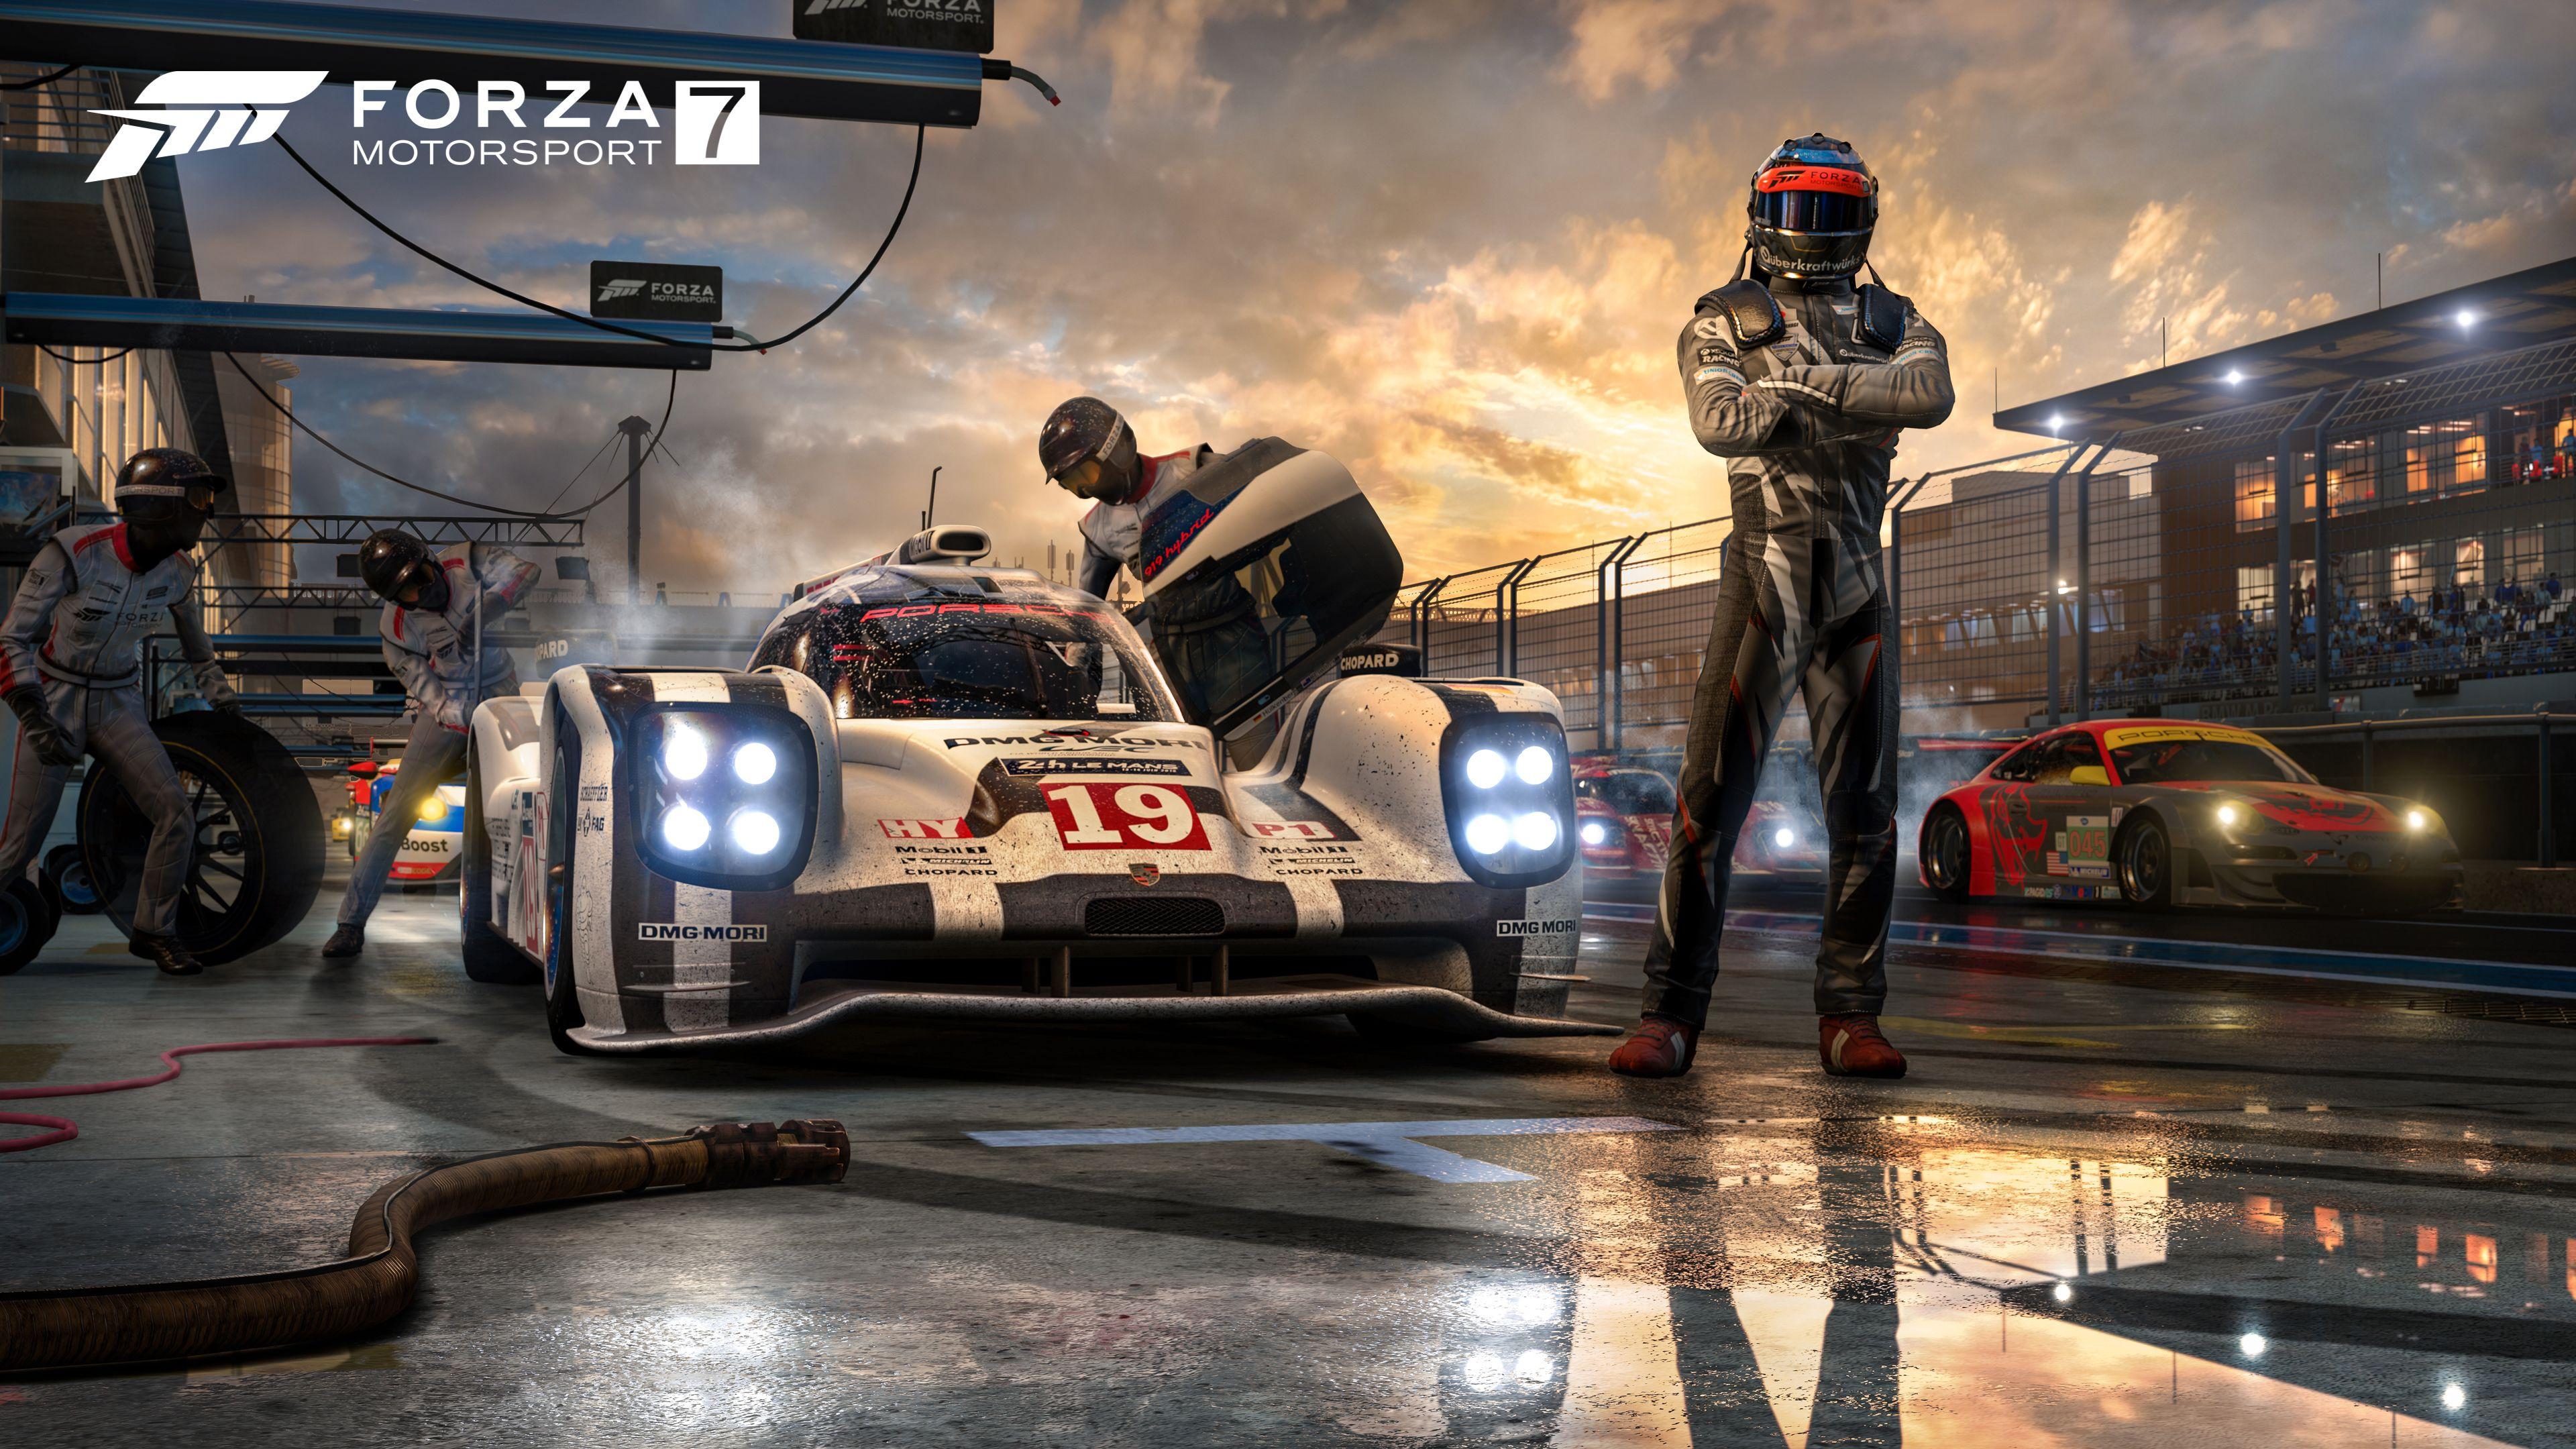 Aston Martin Vulcan Forza Edition By Lrf Works: Forza Motorsport, Racing Simulator